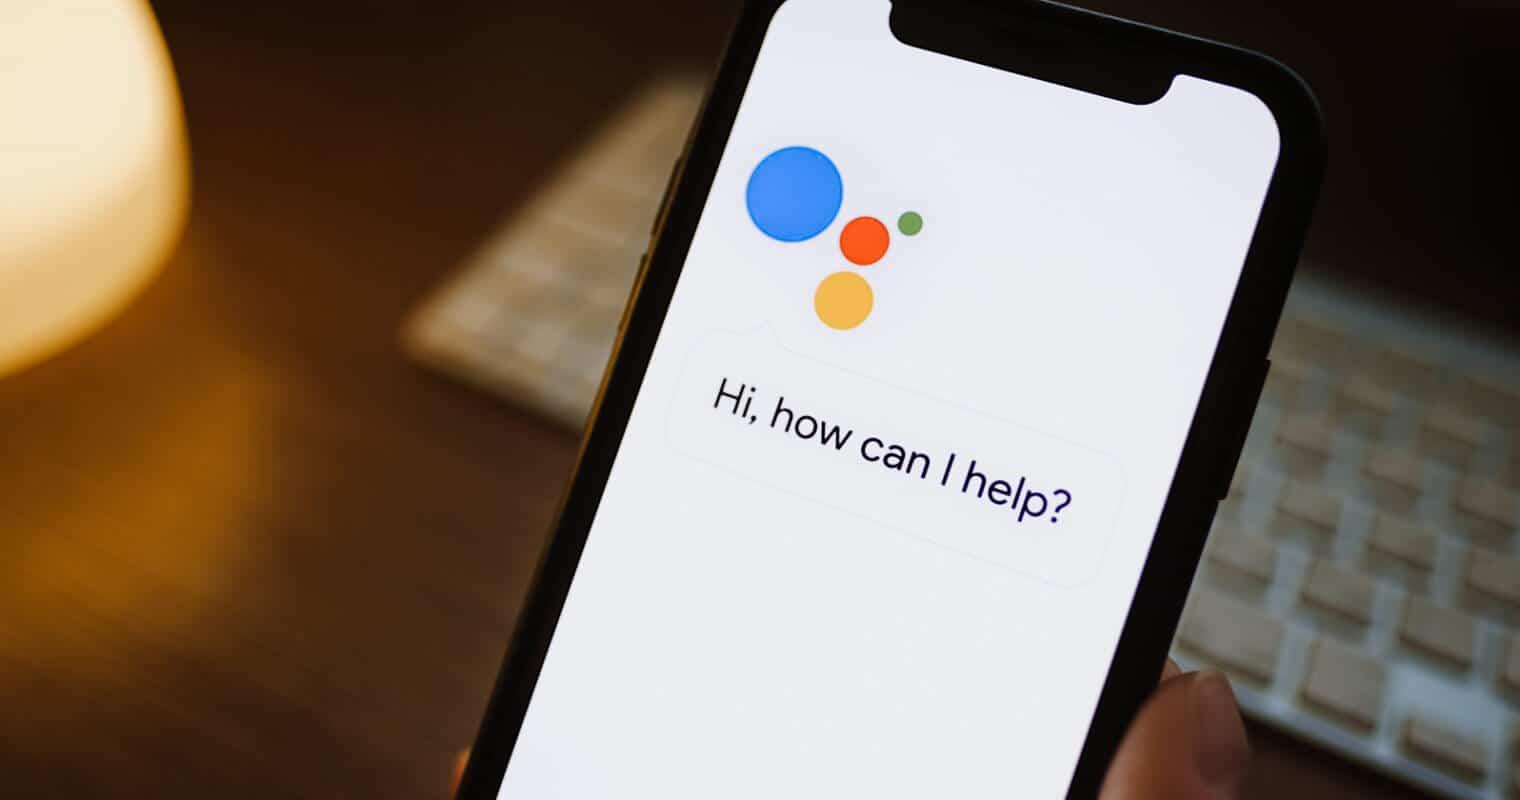 Google's 'Guacamole' will help you do stuff without saying 'hey Google'